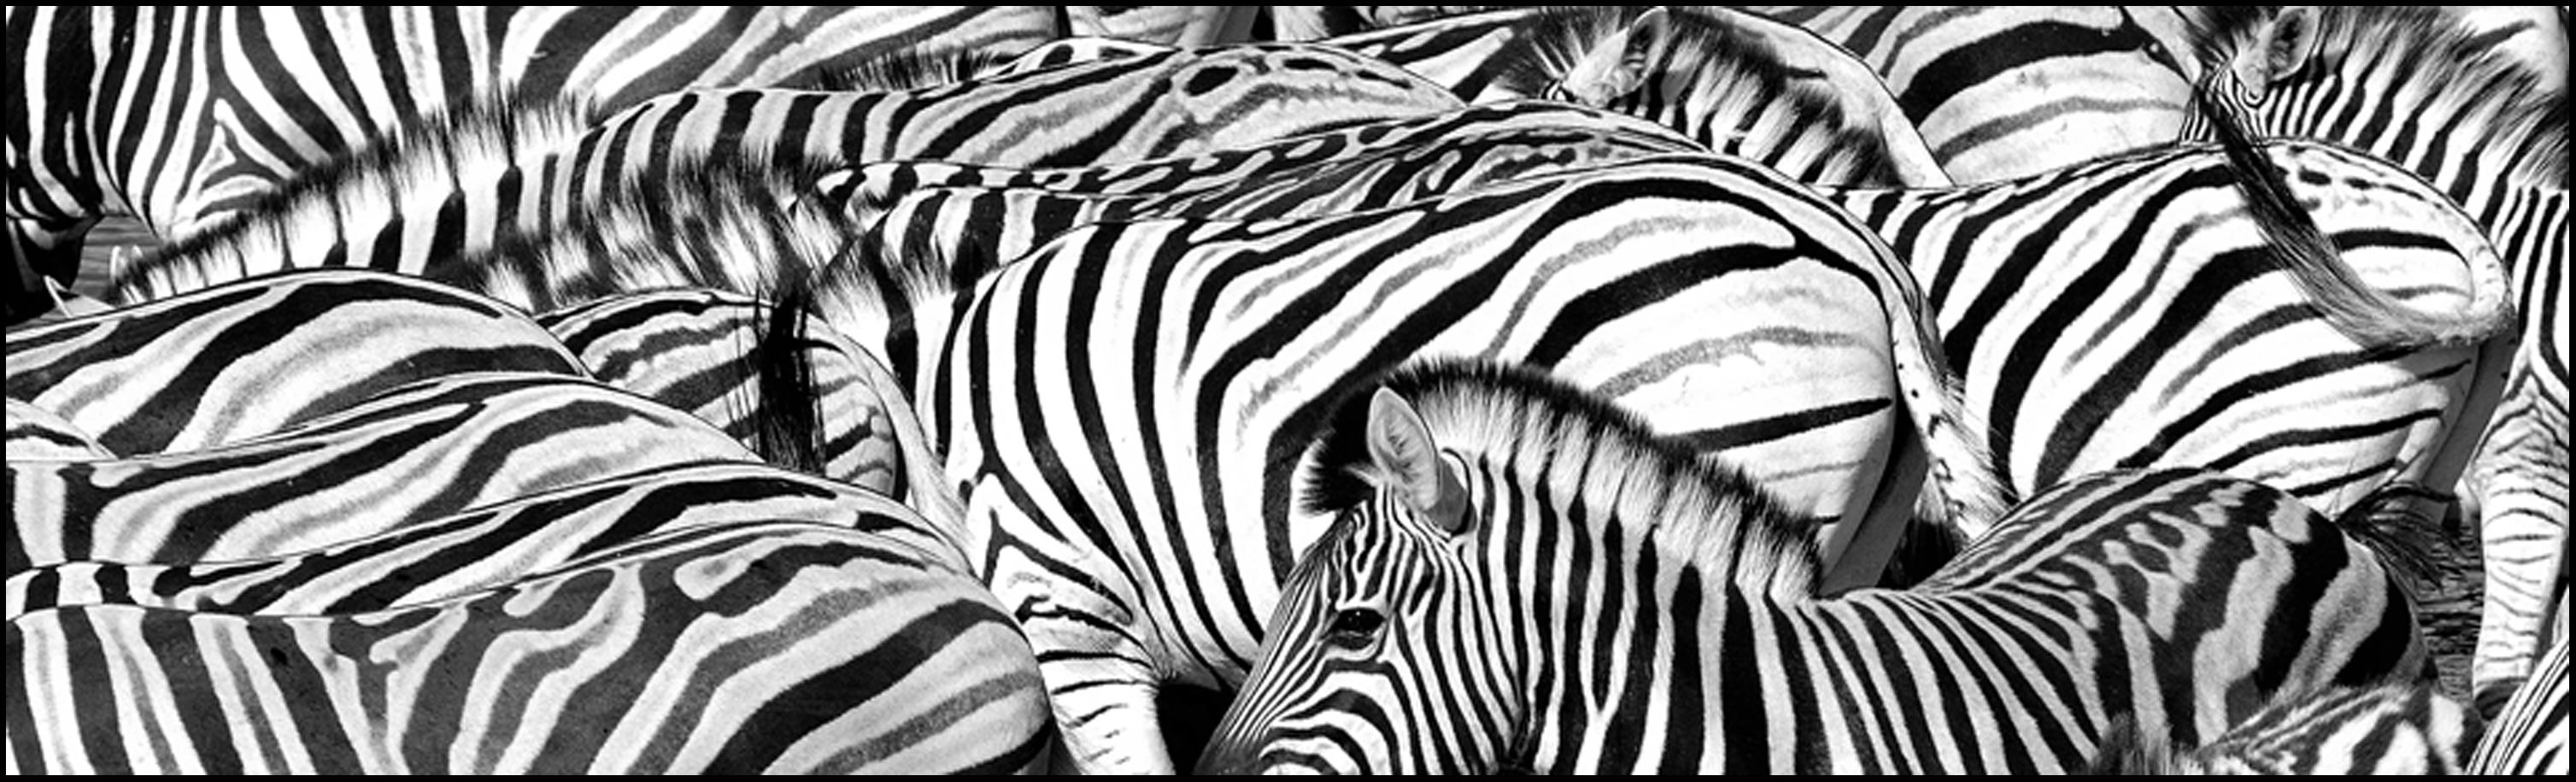 PS8_5086_zebras_3000x900-96